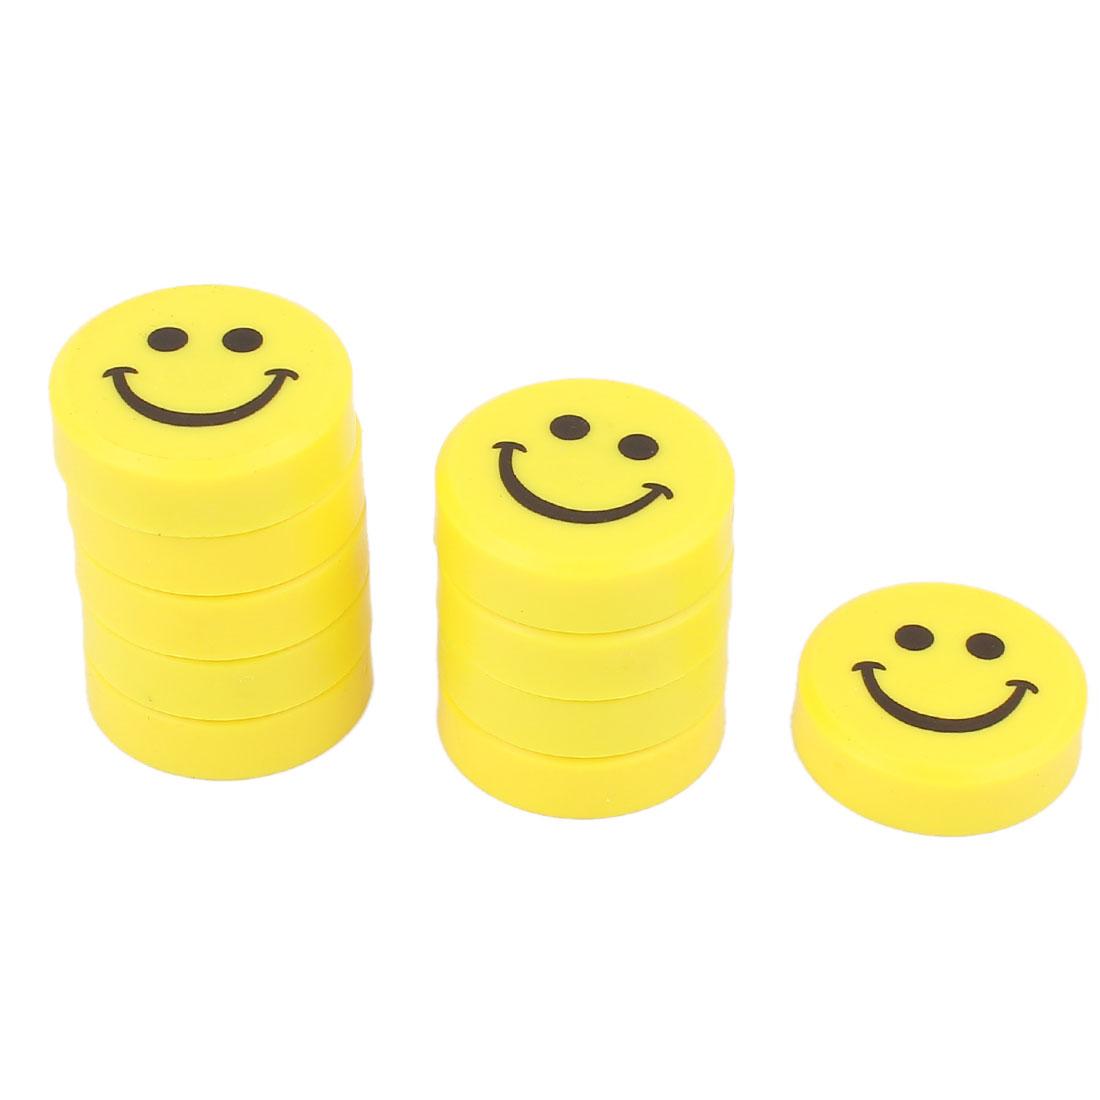 10 Pcs Yellow Plastic Shell Smiling Face Design Whiteboard Fridge Magnetic Sticker